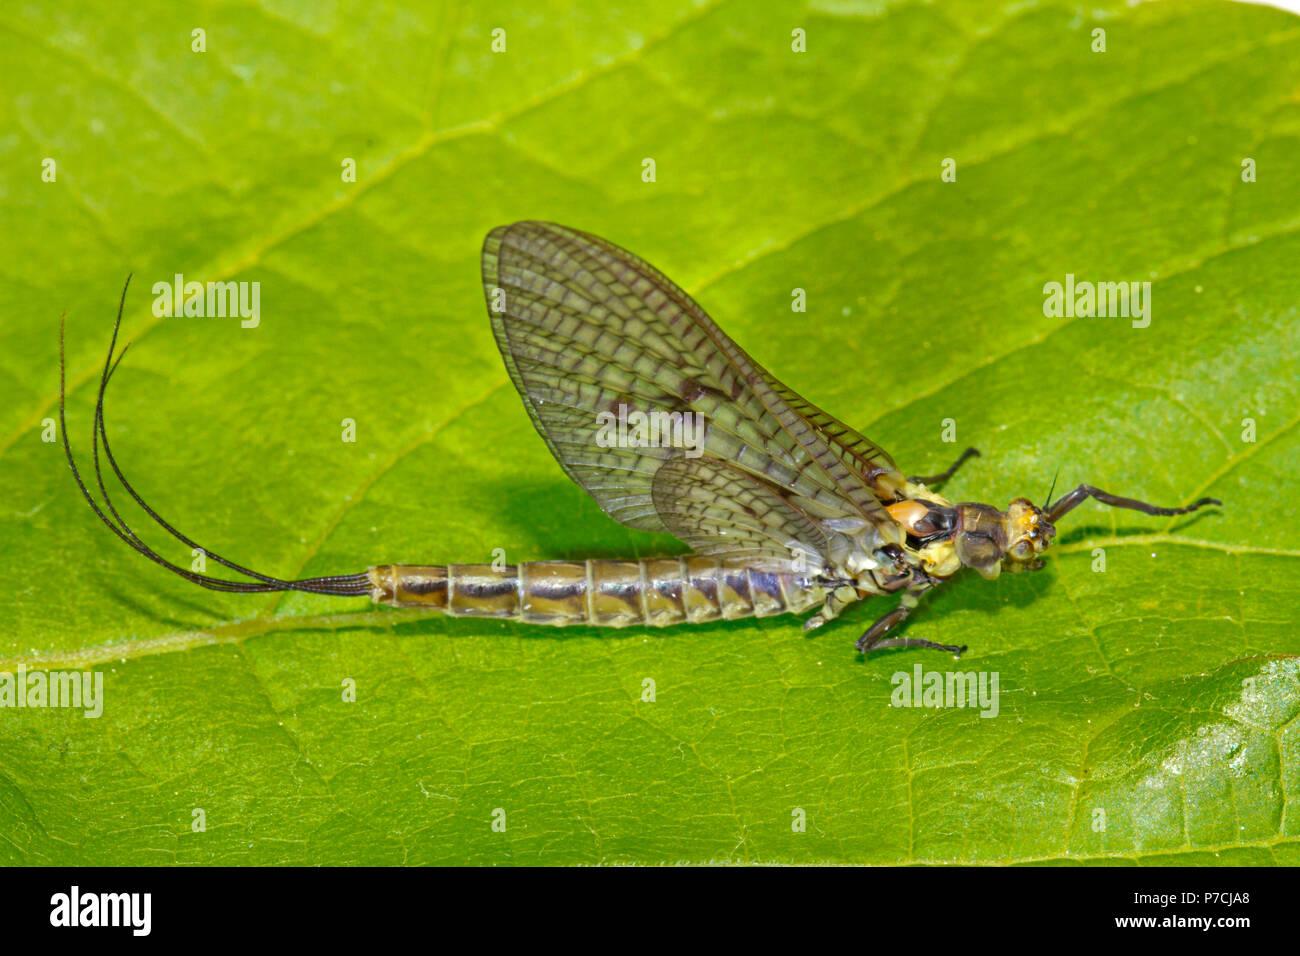 common mayfly, (Ephemera danica) - Stock Image